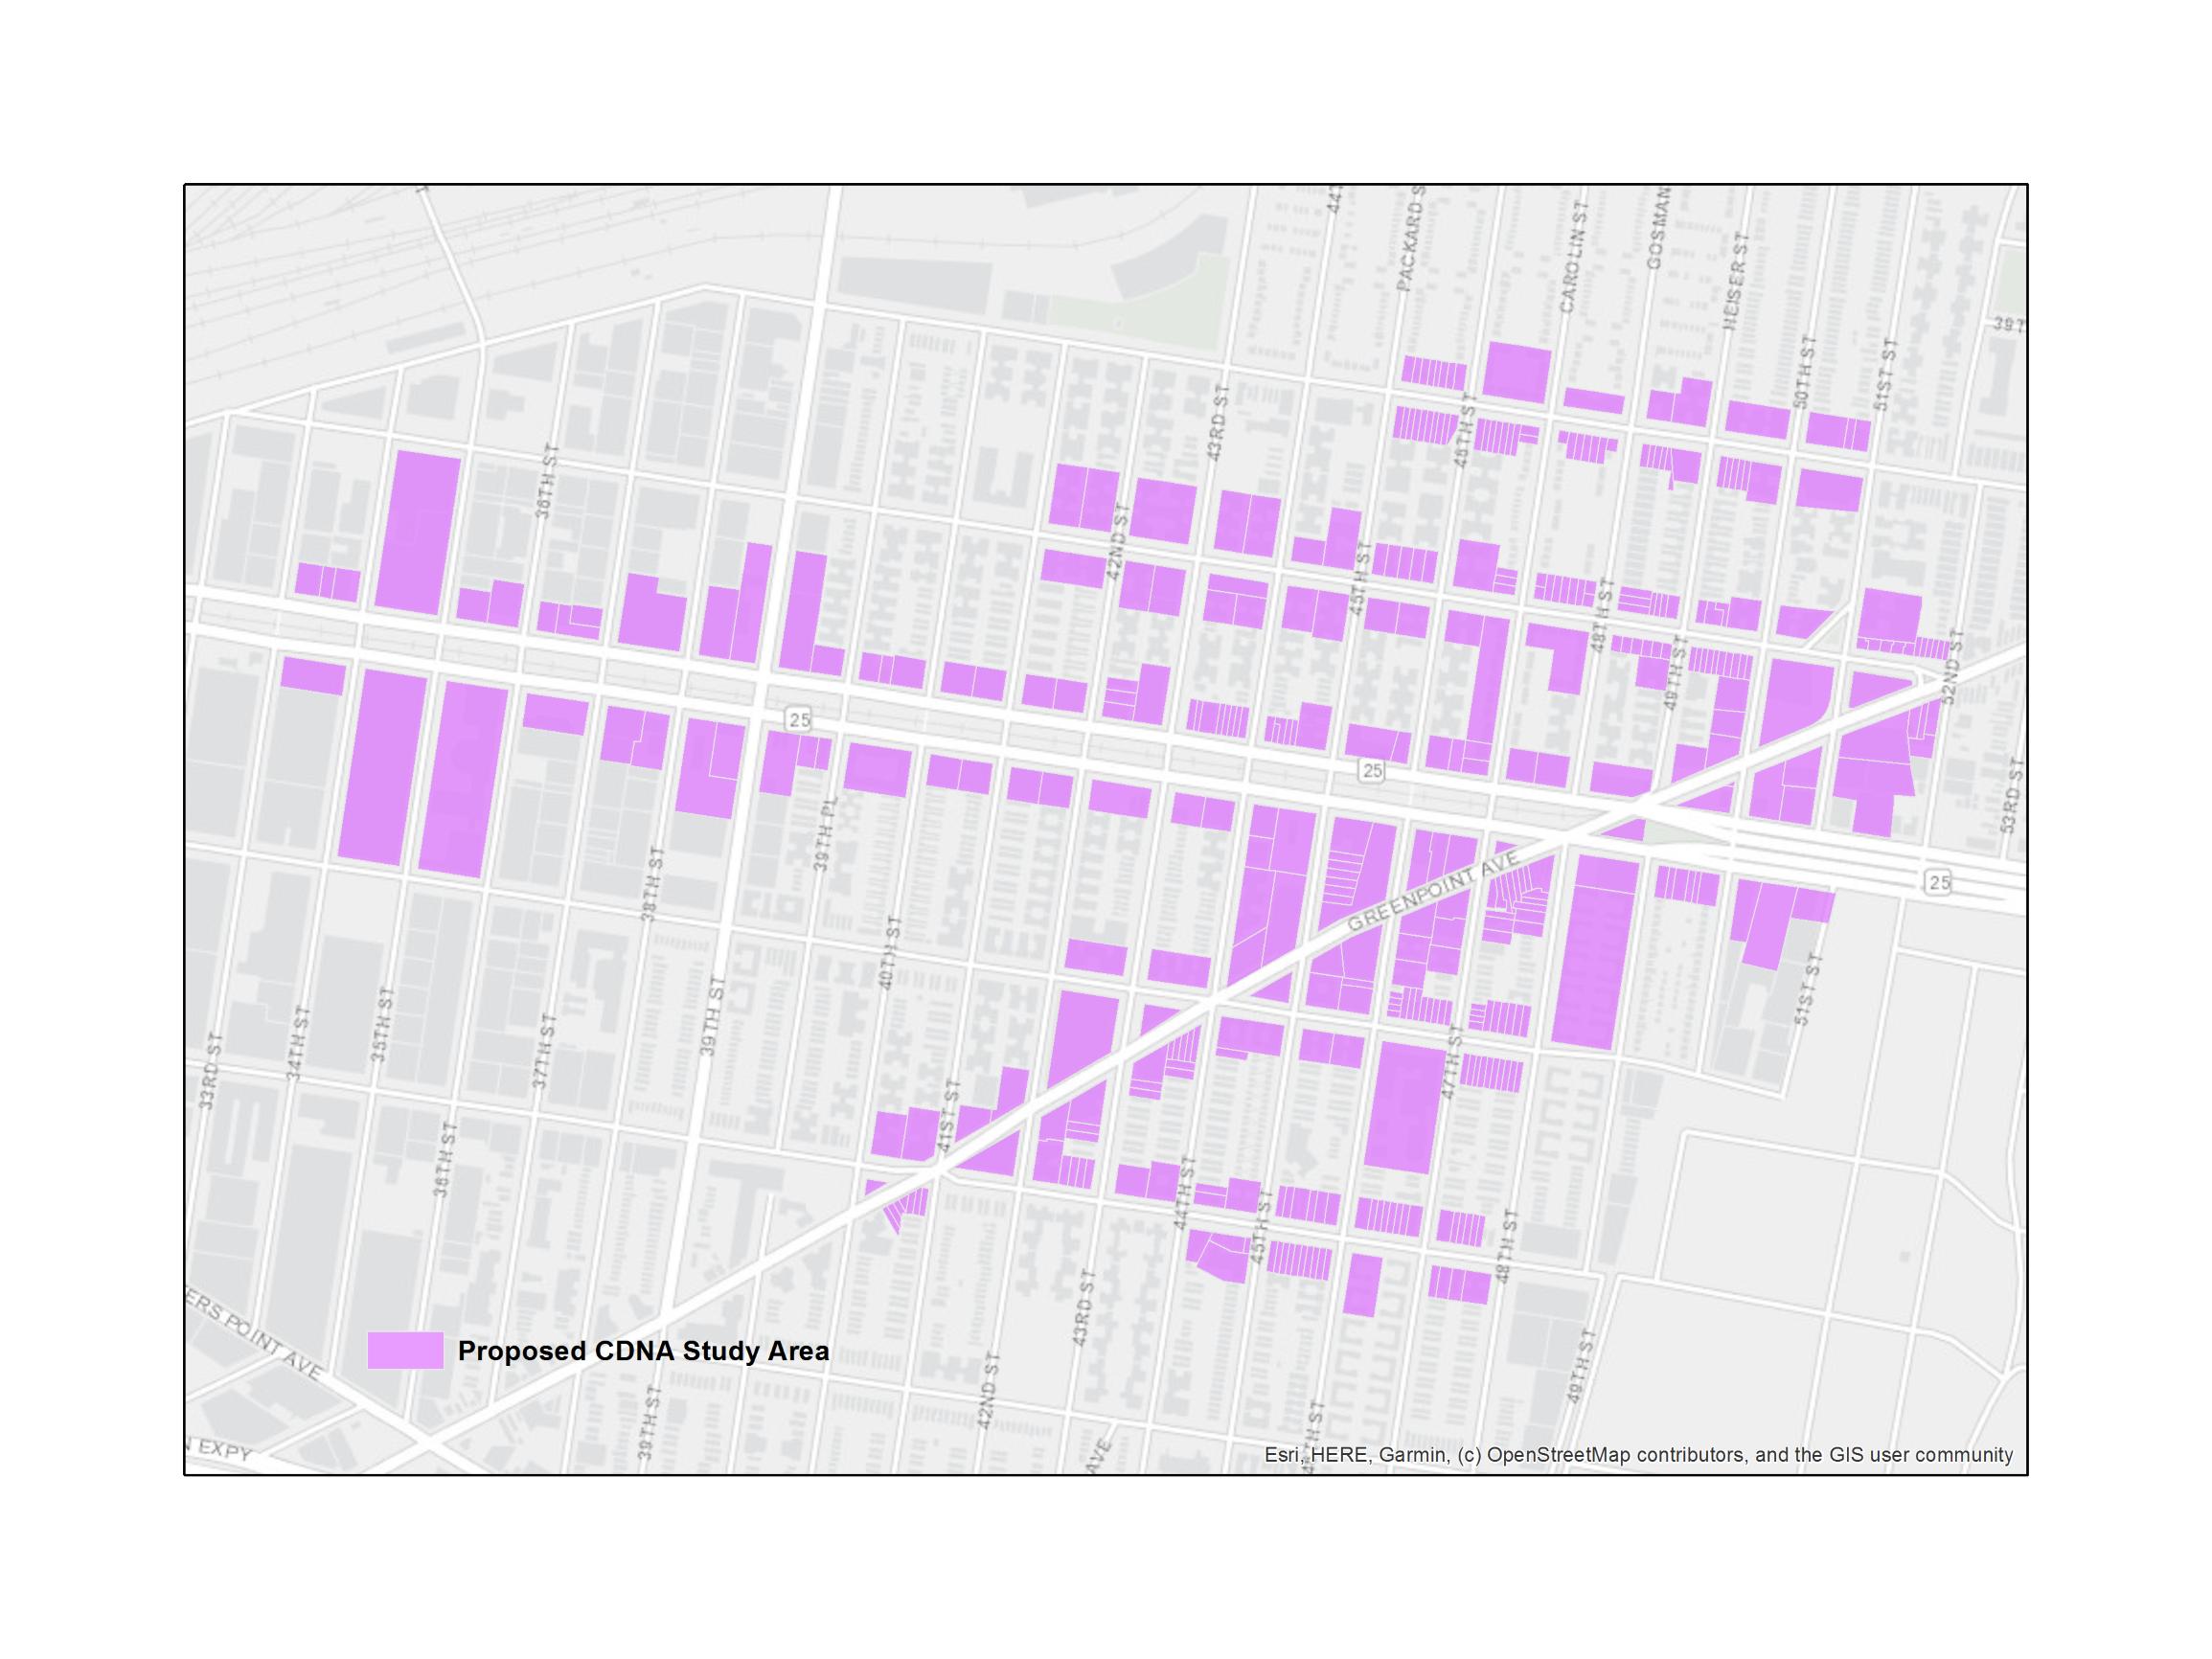 The CDNA study comprises of properties along the Sunnyside business corridor.